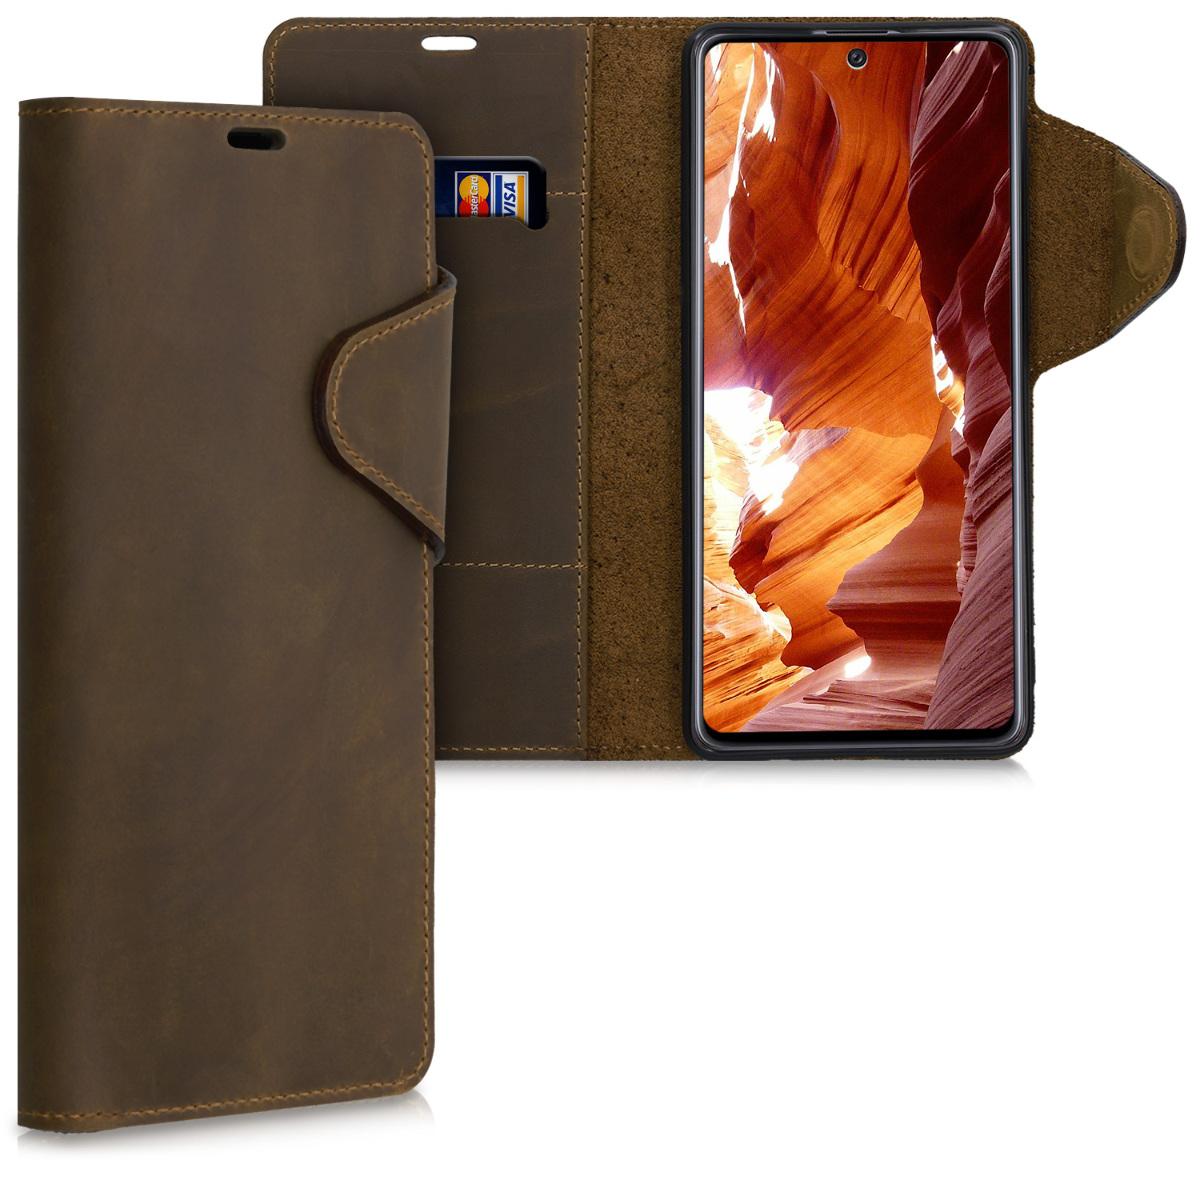 Kalibri Δερμάτινη Suede Θήκη - Πορτοφόλι Samsung Galaxy A71 - Brown (51291.05)